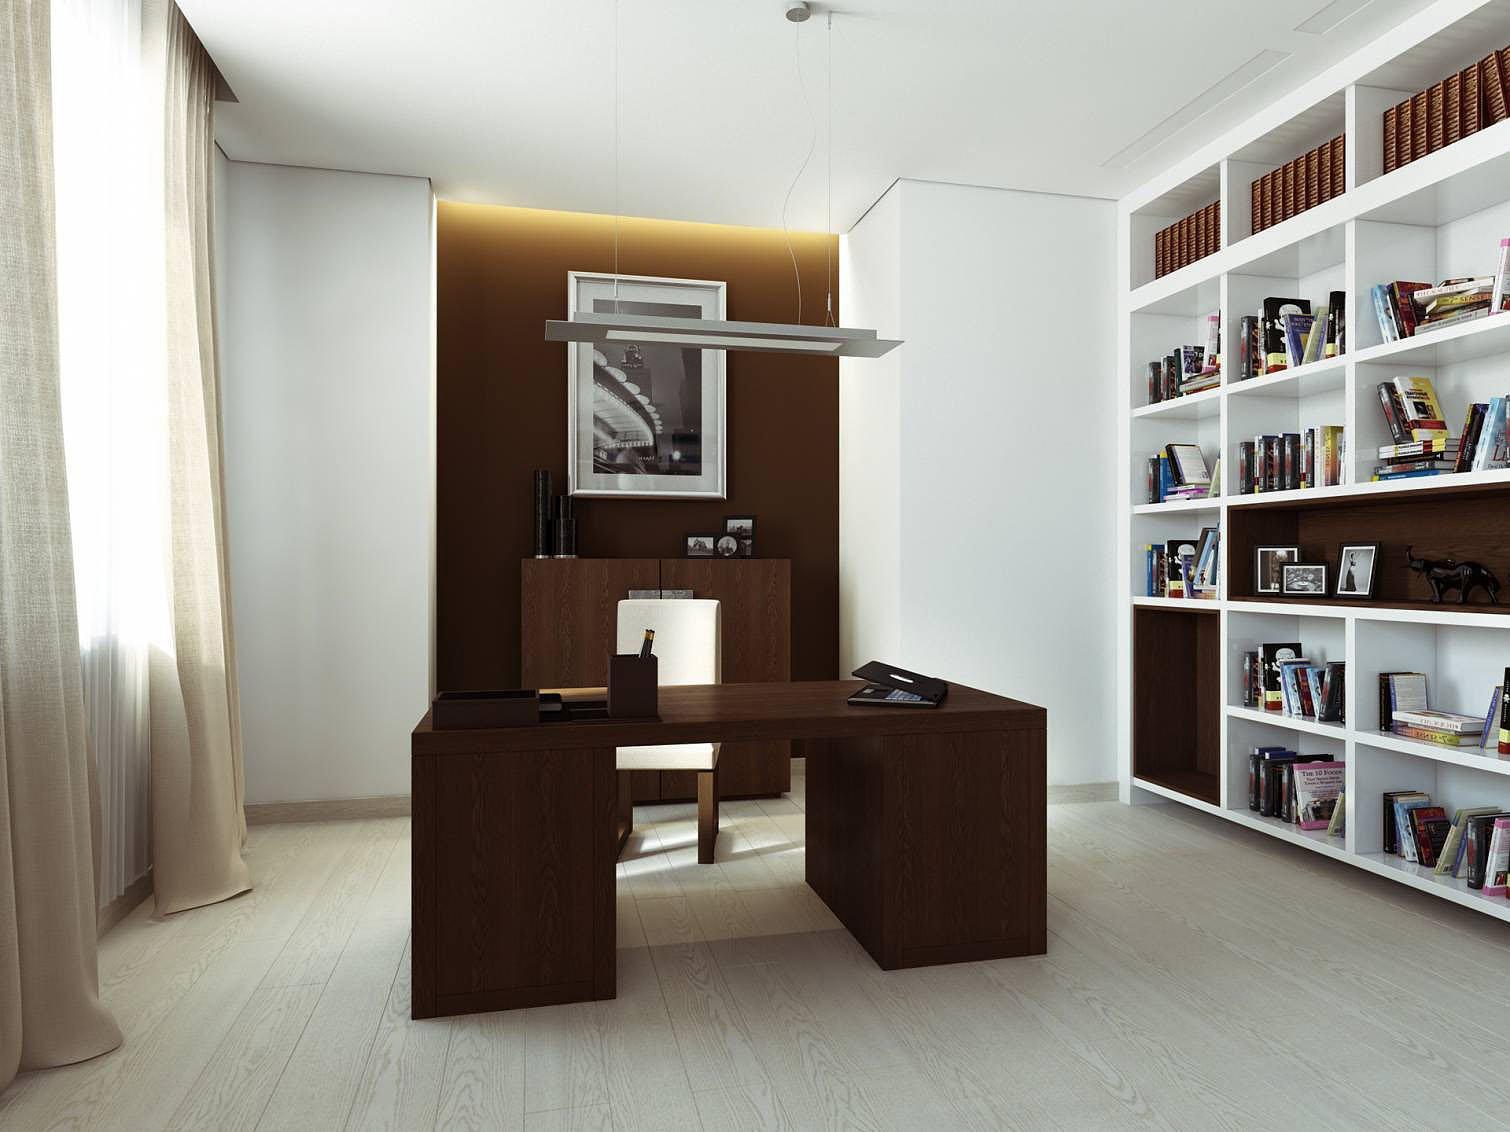 Apartment-Design-in-Moskovyan-Plaza-15